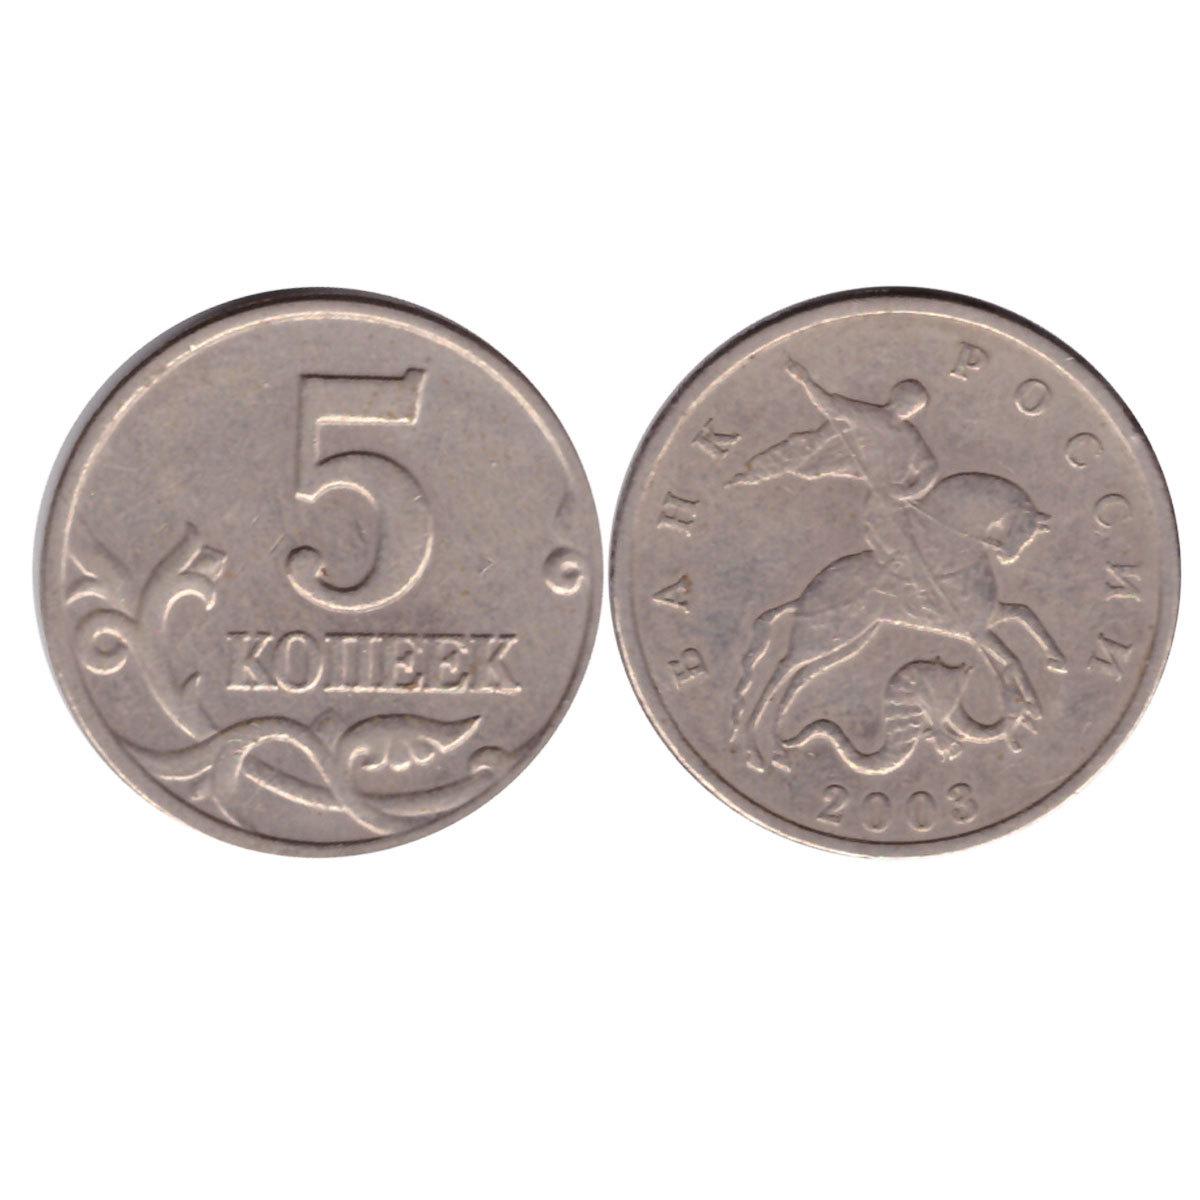 5 копеек 2003 г. Без знака (обозначения) монетного двора. F-VF